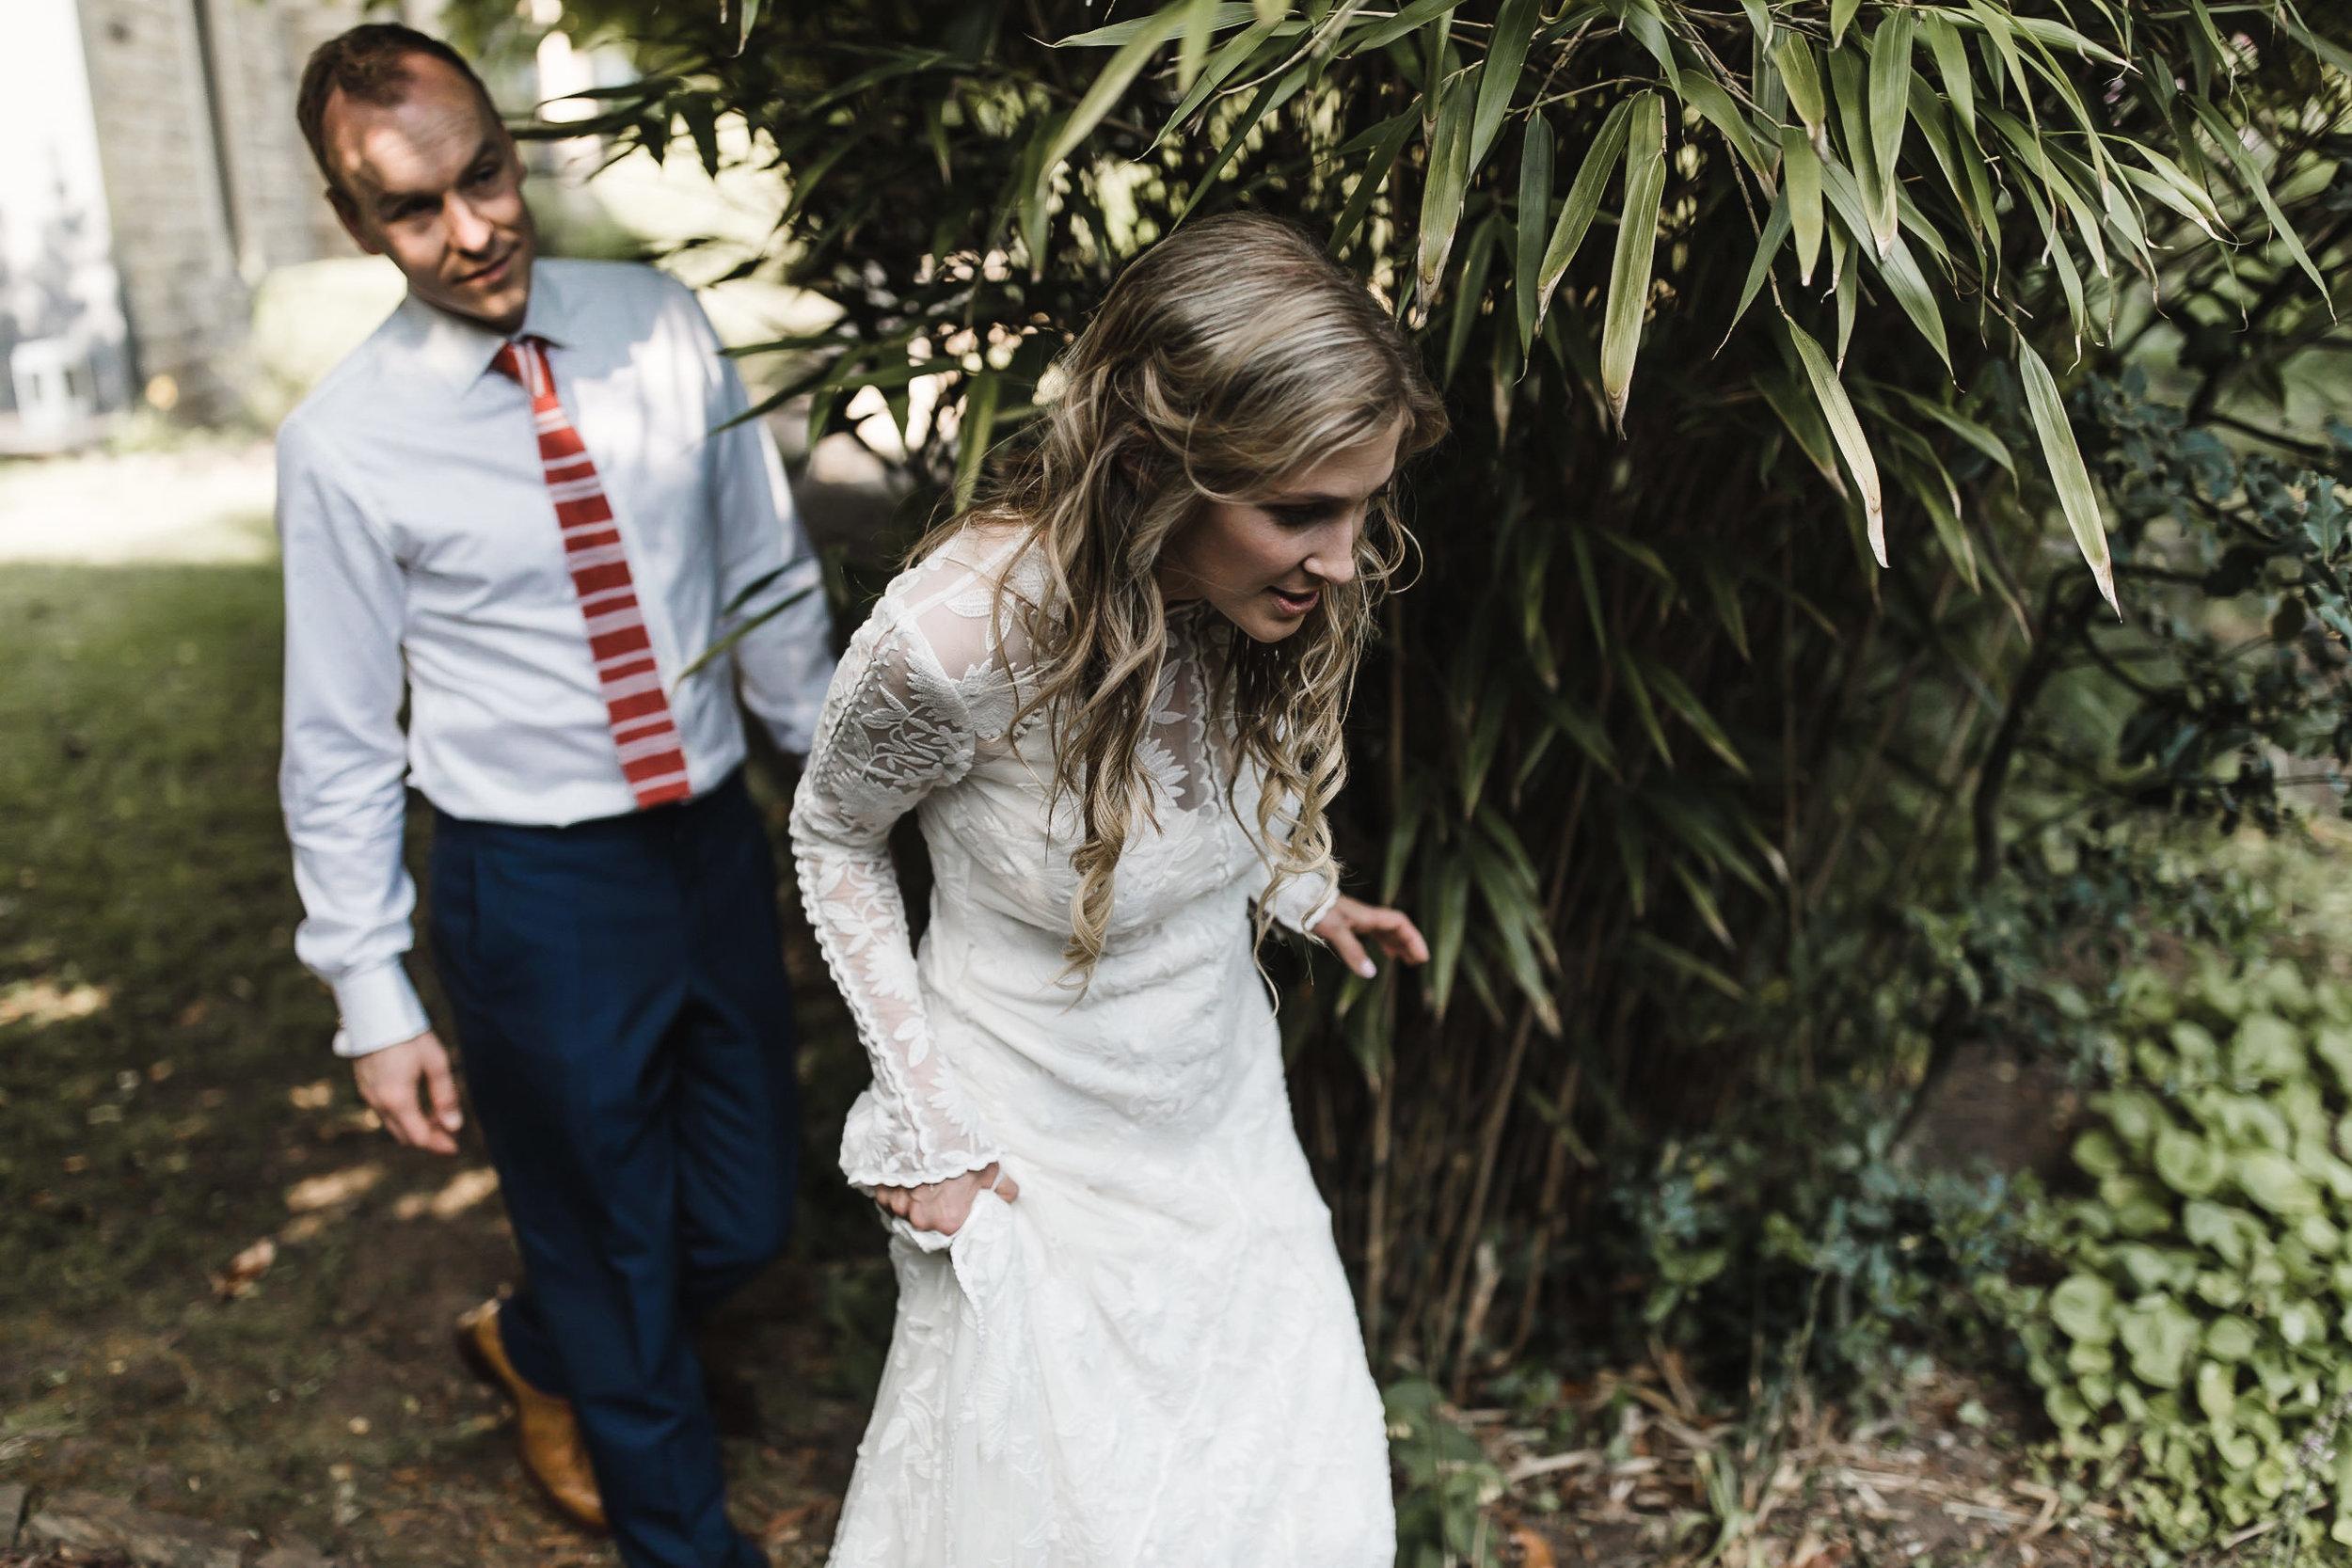 Roundhay-Leeds-Backyard-Wedding-Becs-Chris-183.jpg